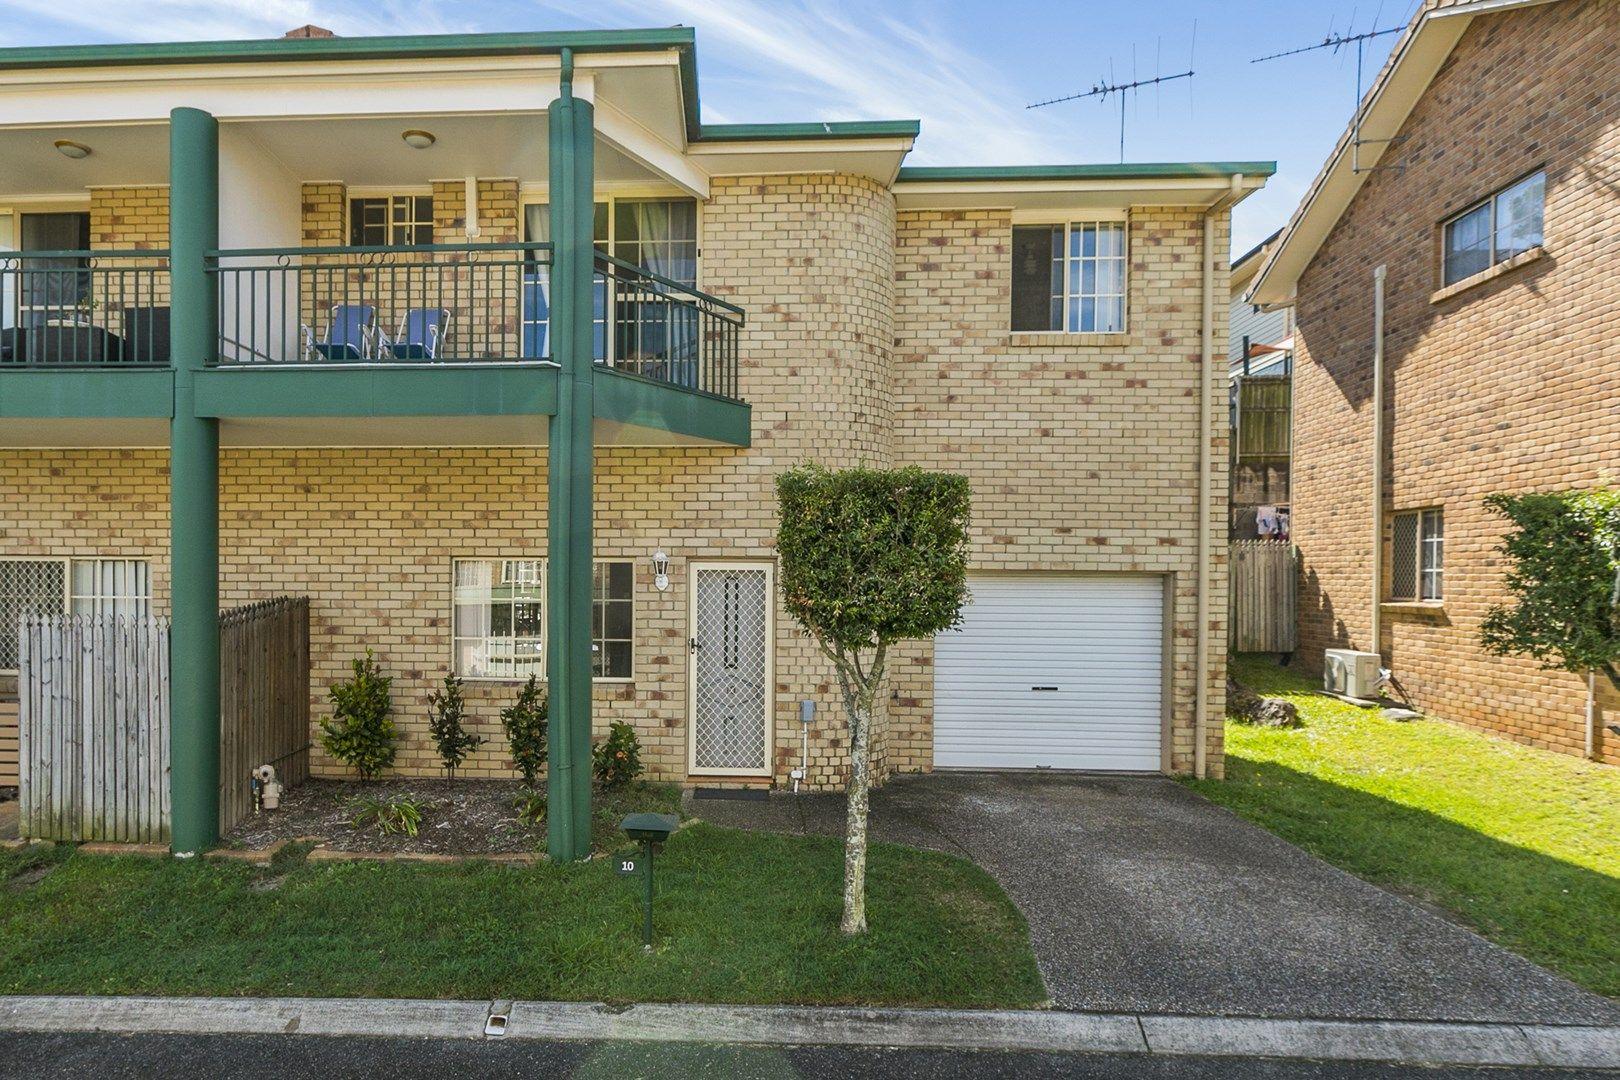 10/1162 Cavendish Road, Mount Gravatt East QLD 4122, Image 0